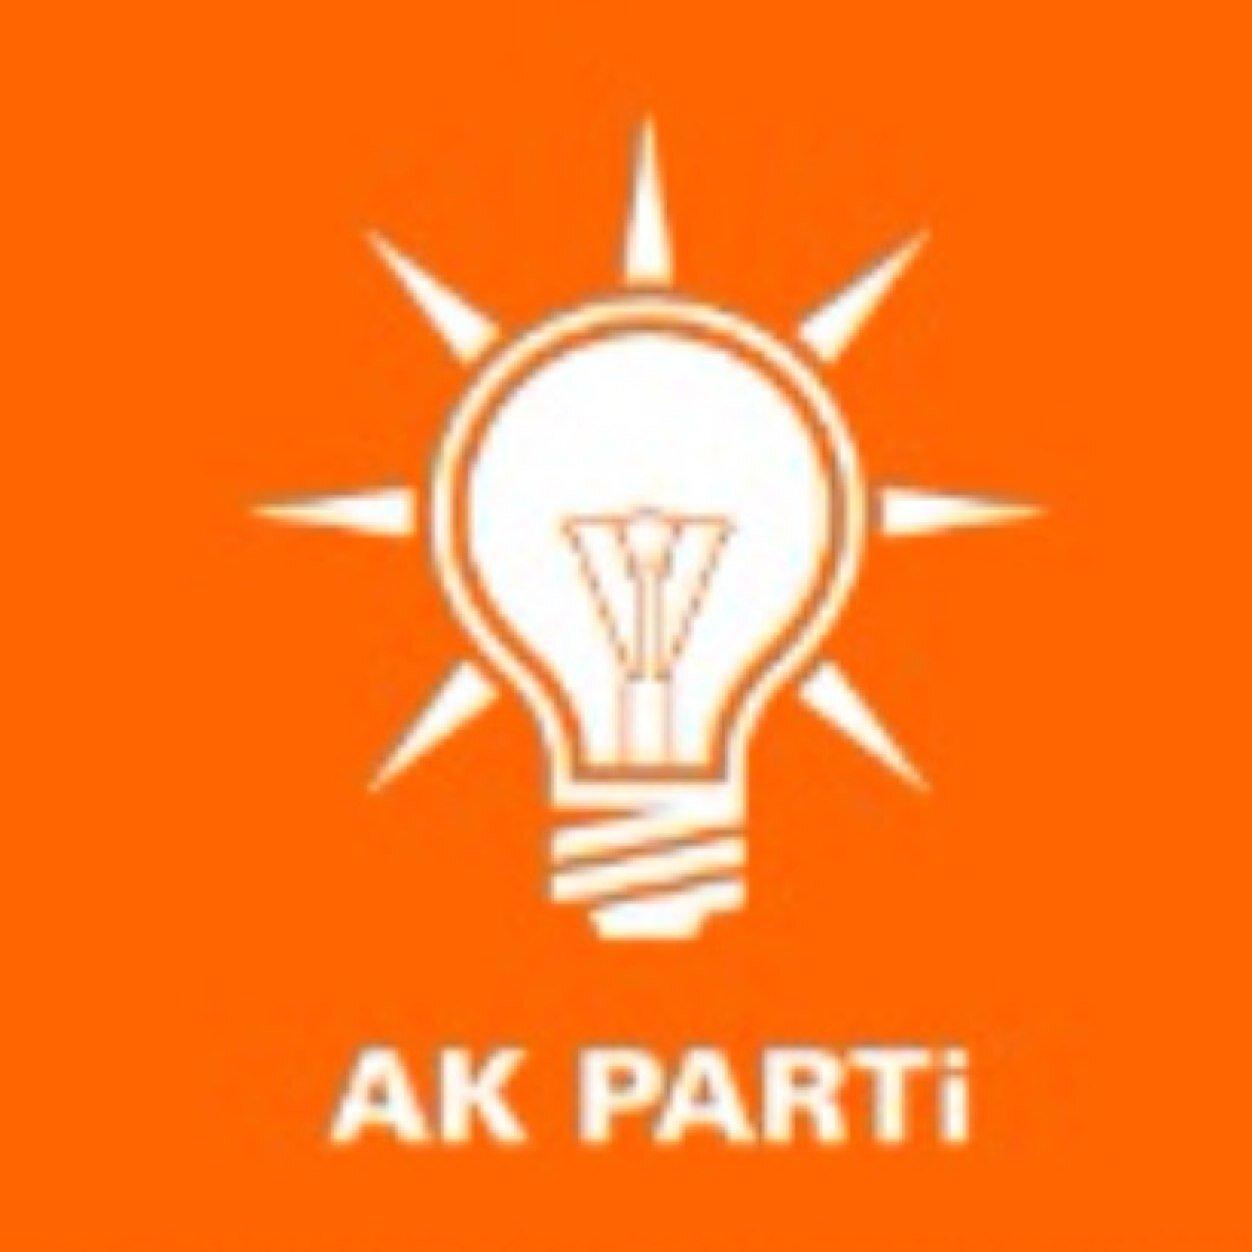 AK Parti Ordu (@AkPartiOrdu) | Twitter